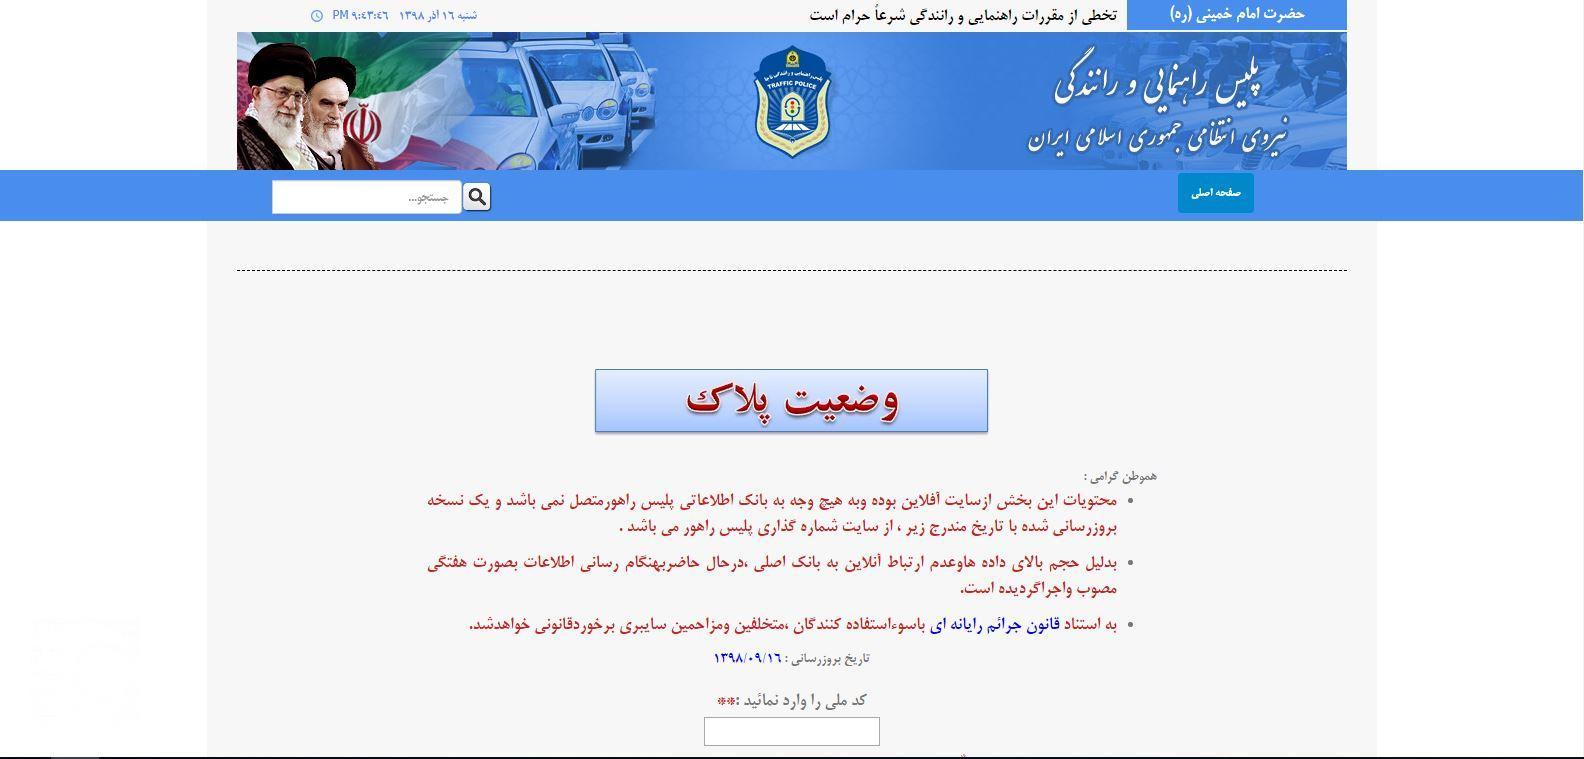 پیگیری فک پلاک در سایت راهور